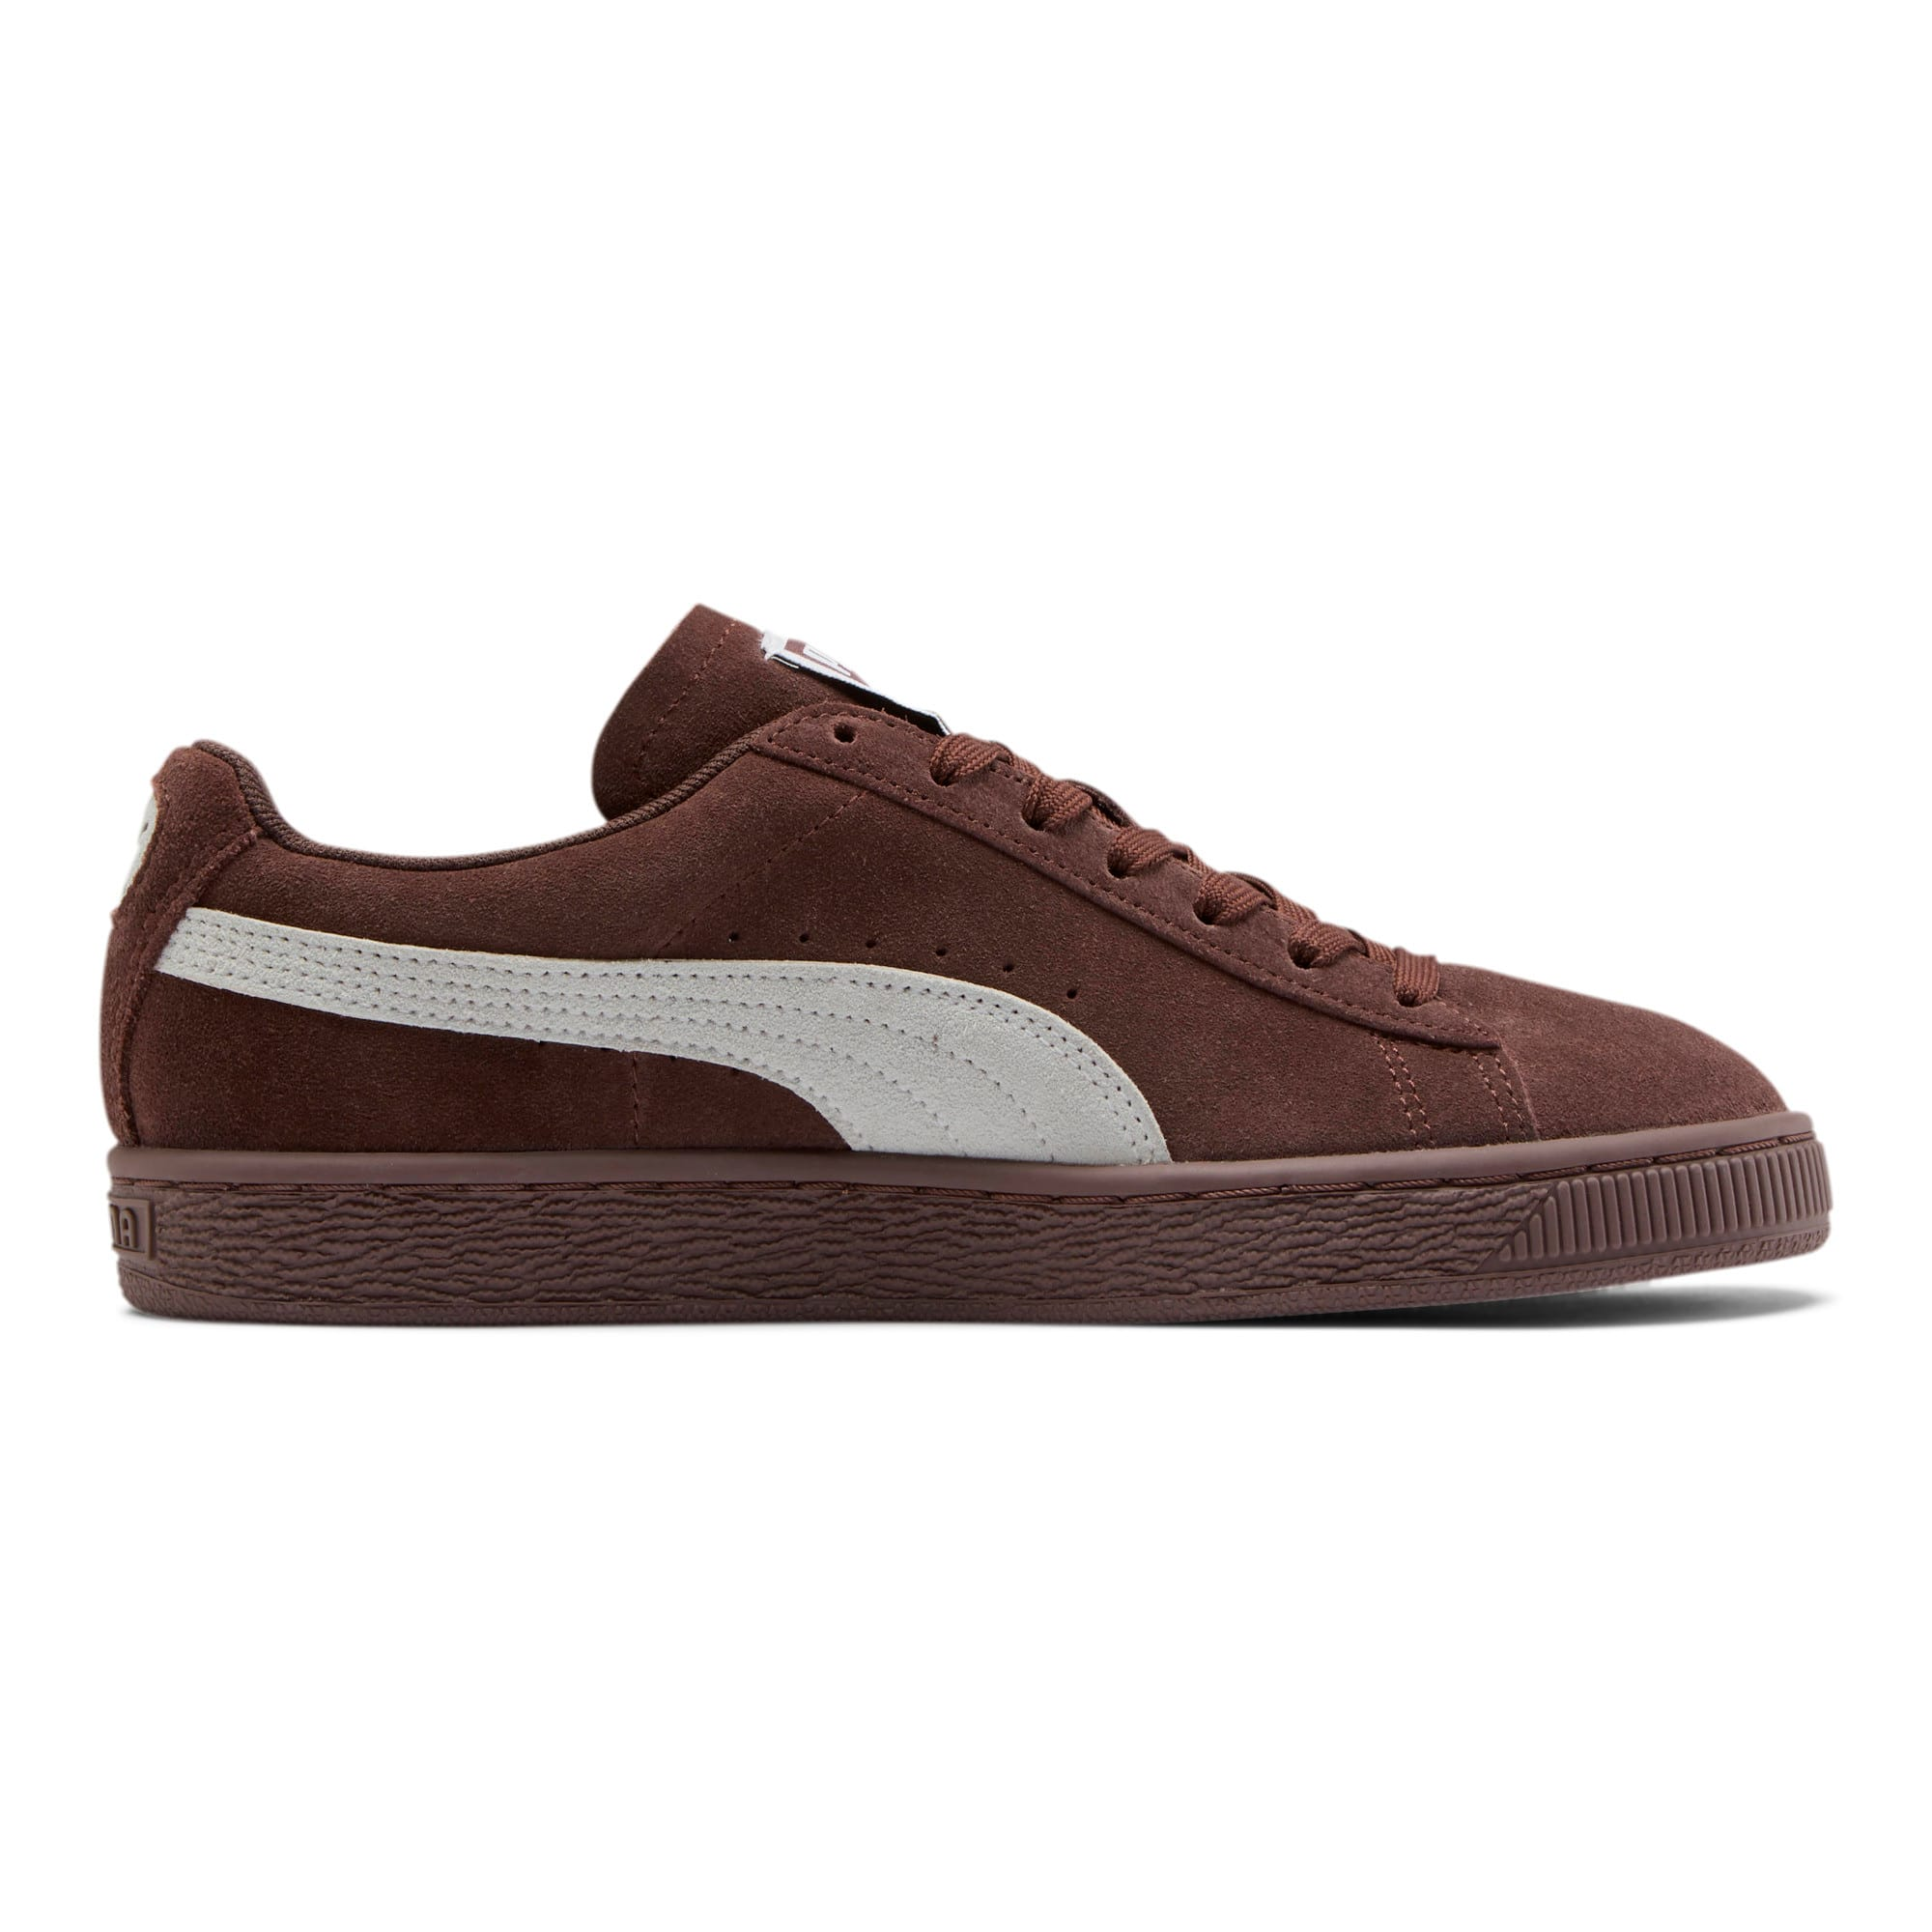 Thumbnail 5 of Suede Classic Women's Sneakers, Peppercorn-Puma White, medium